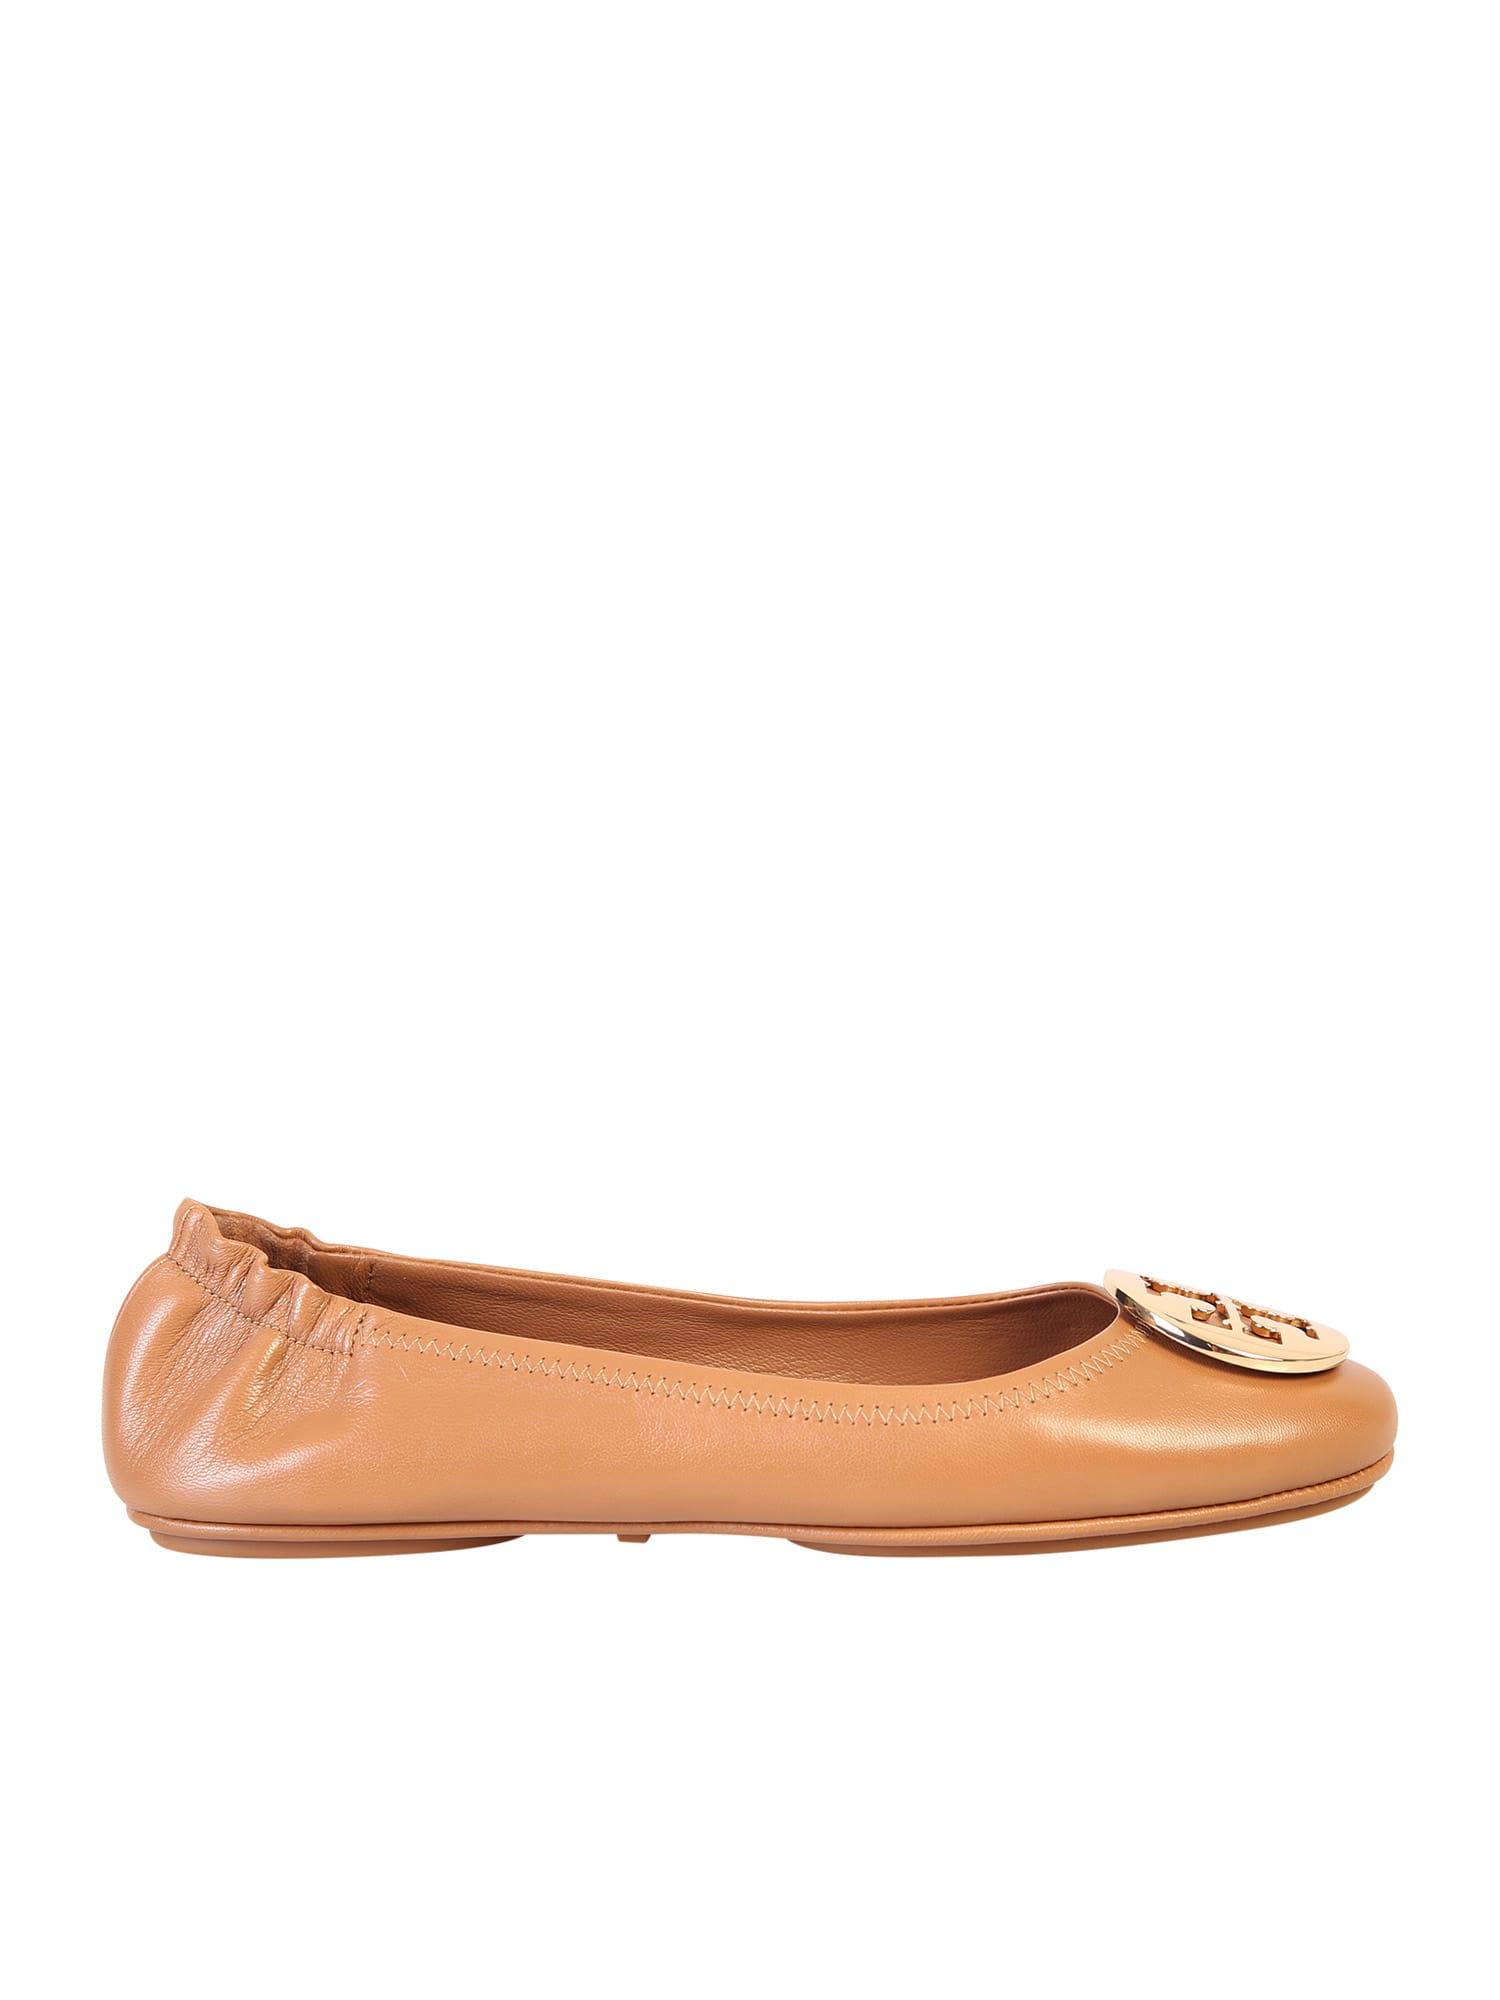 Tory Burch Minnie Ballerina Flats